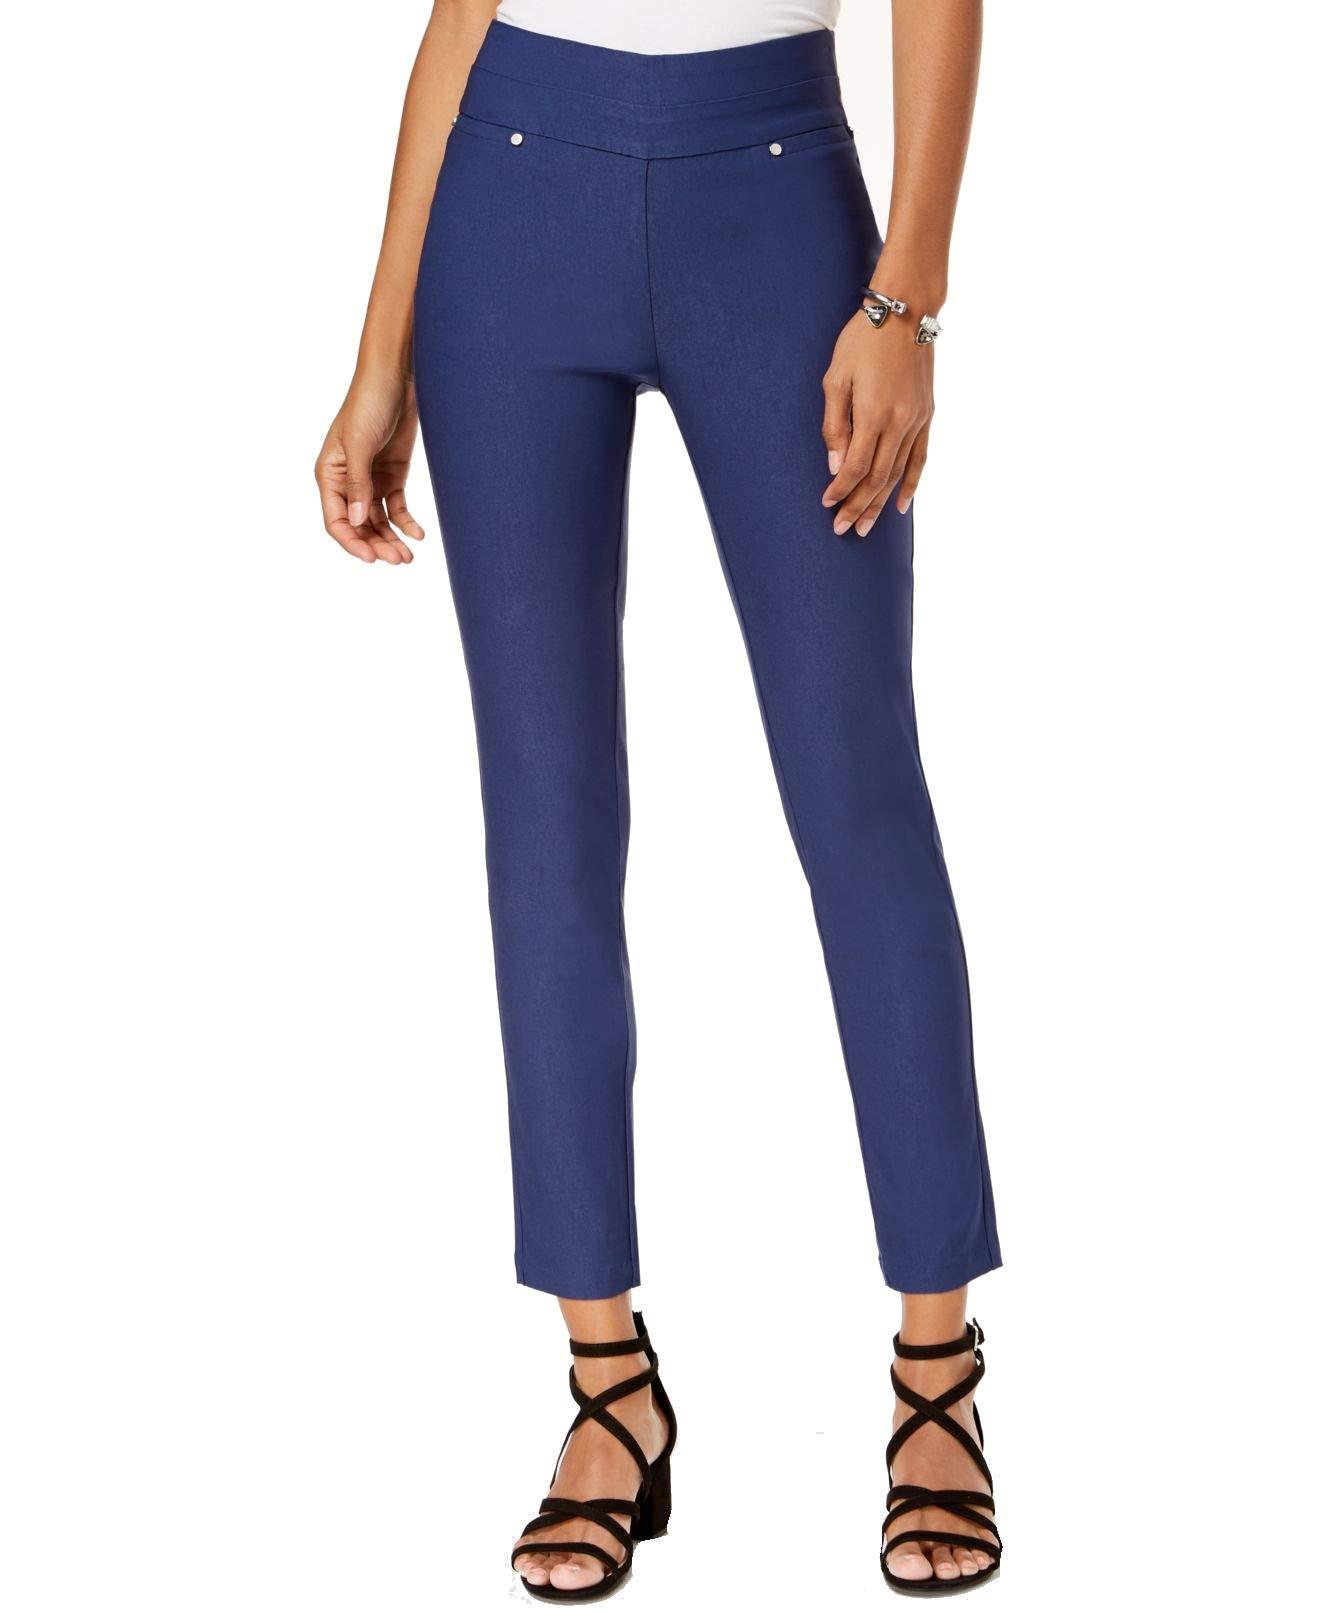 XOXO Women's Jr Colored Pull-On Skinny Pants Blue Depths 4